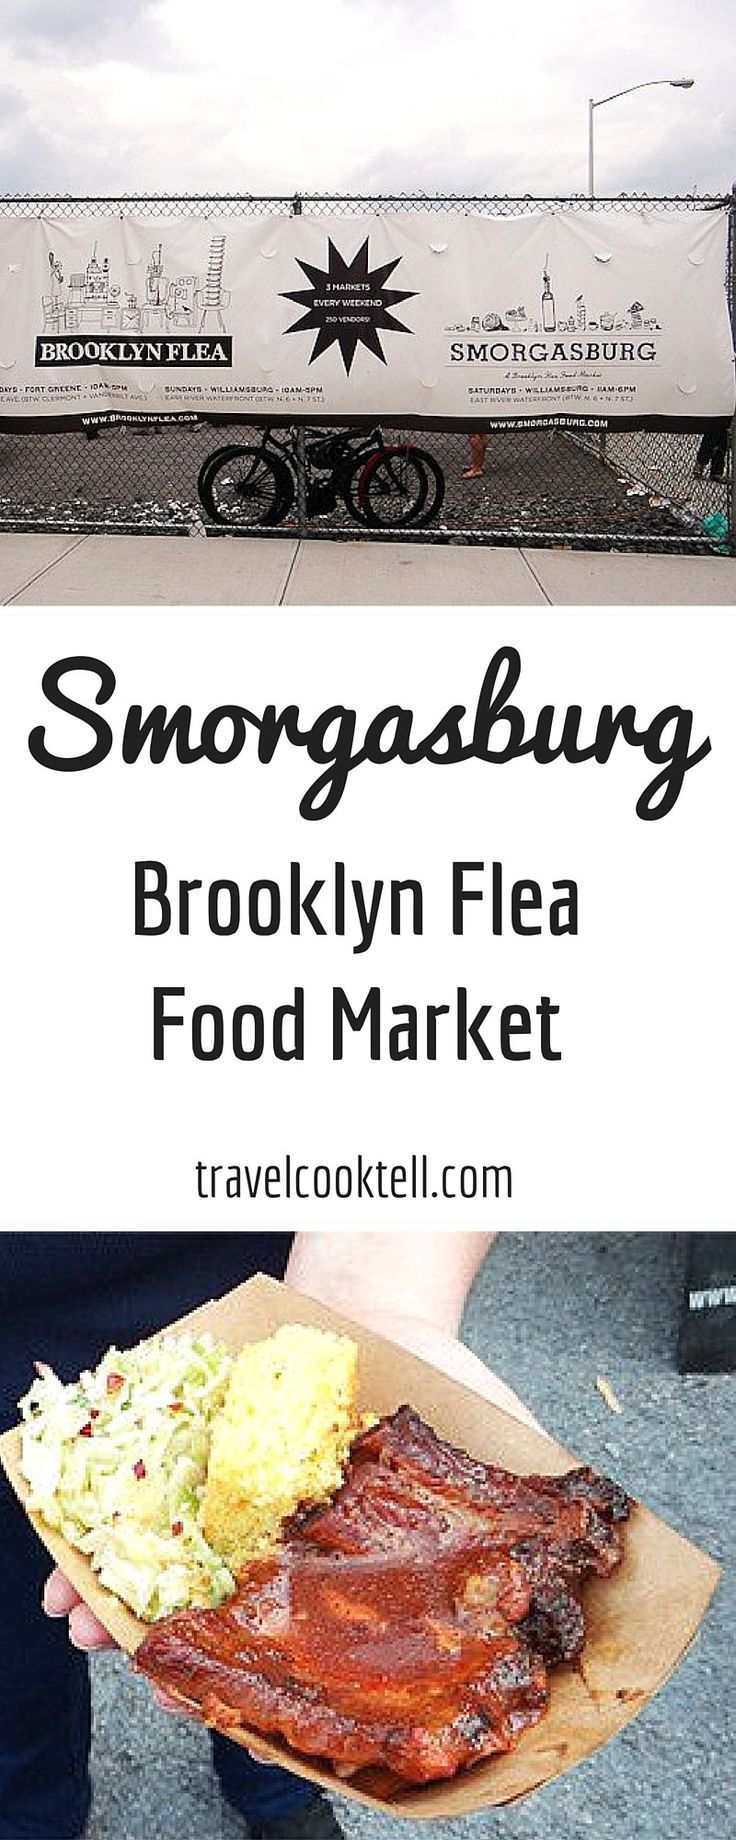 Smorgasburg: Brooklyn Flea Food Market | Travel Cook Tell